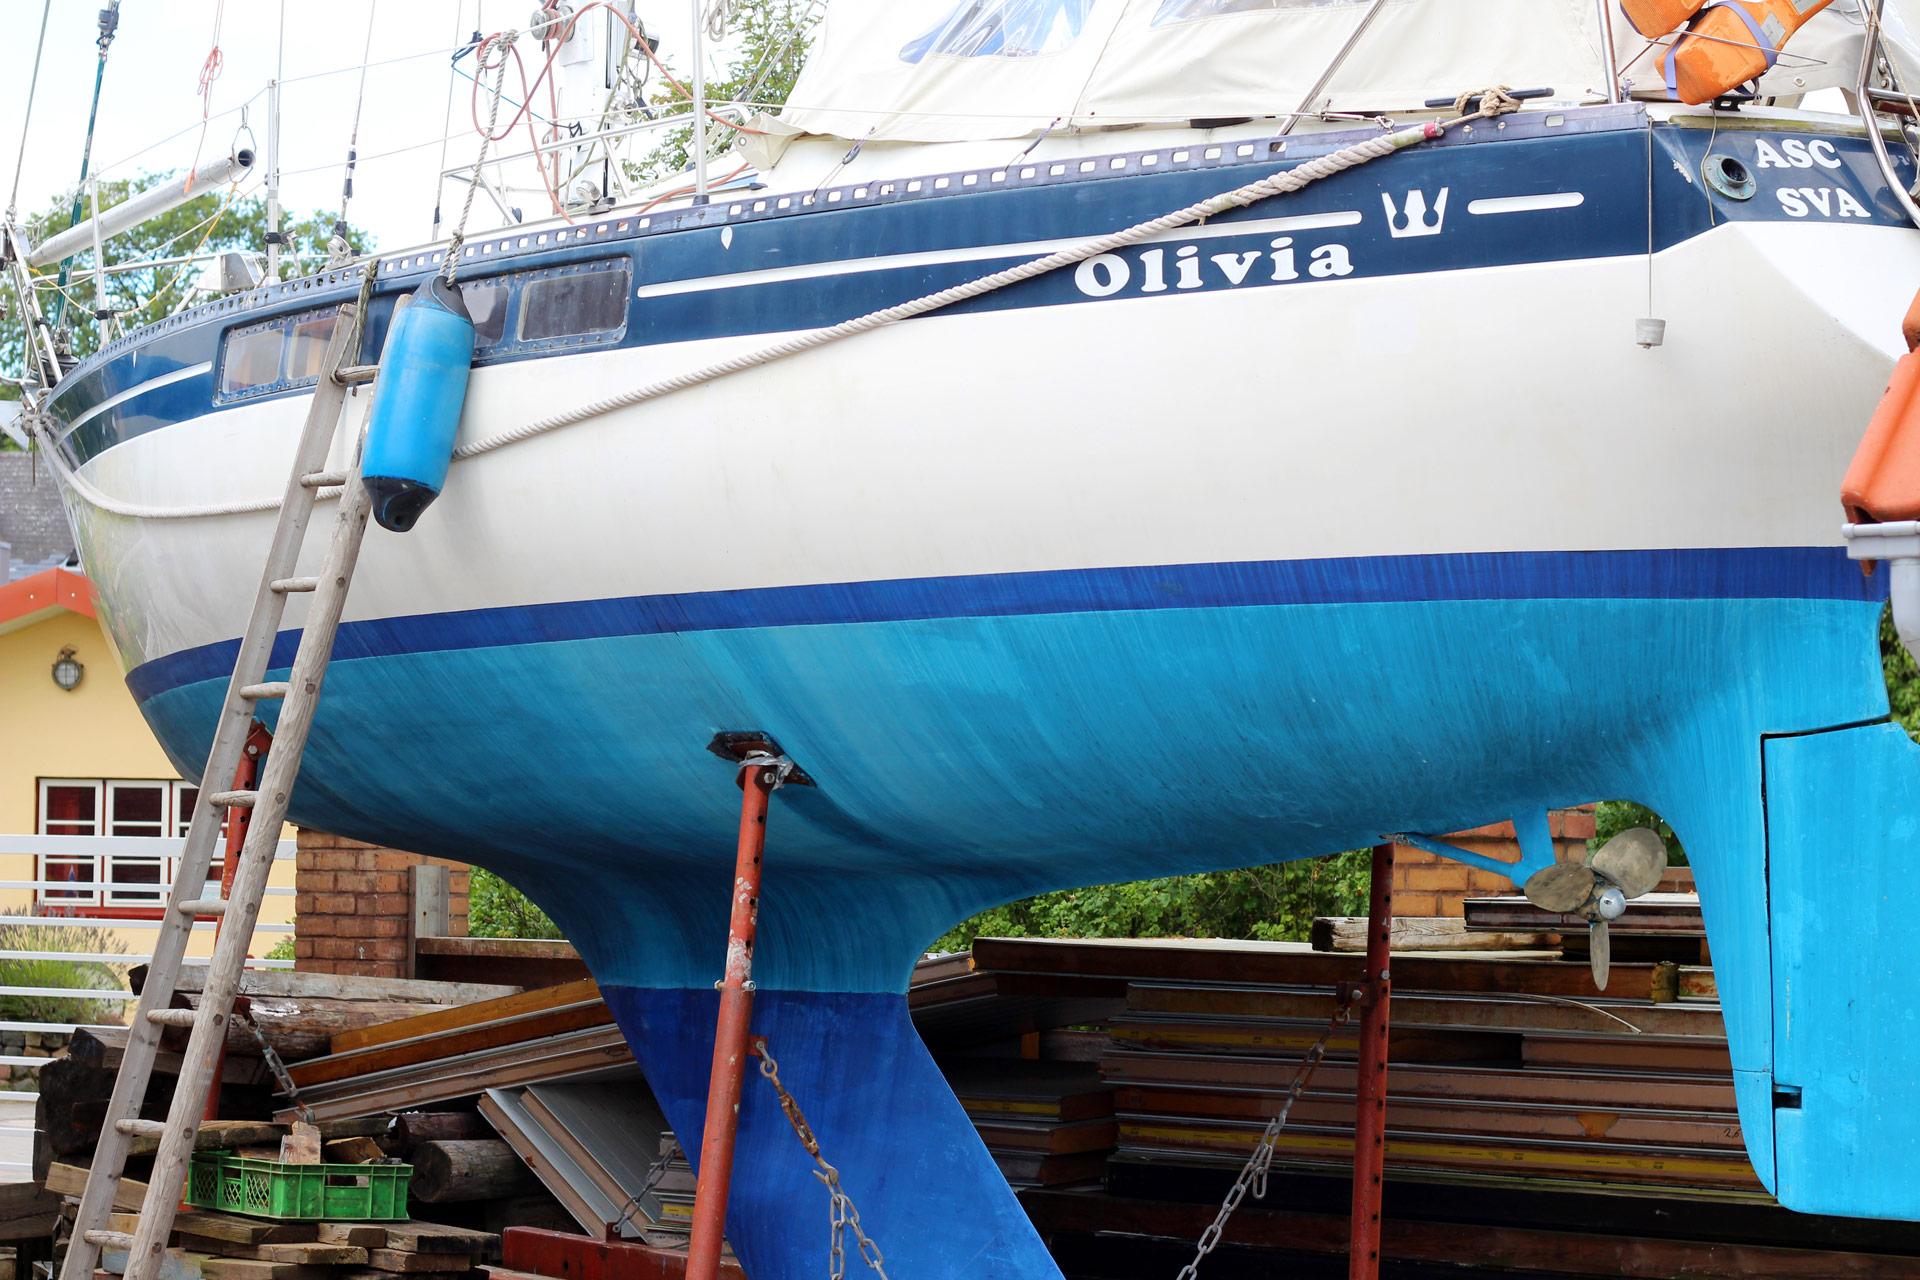 This still beautiful 40 year ol Kingscruiser 33 hull has a 103 Yardstick